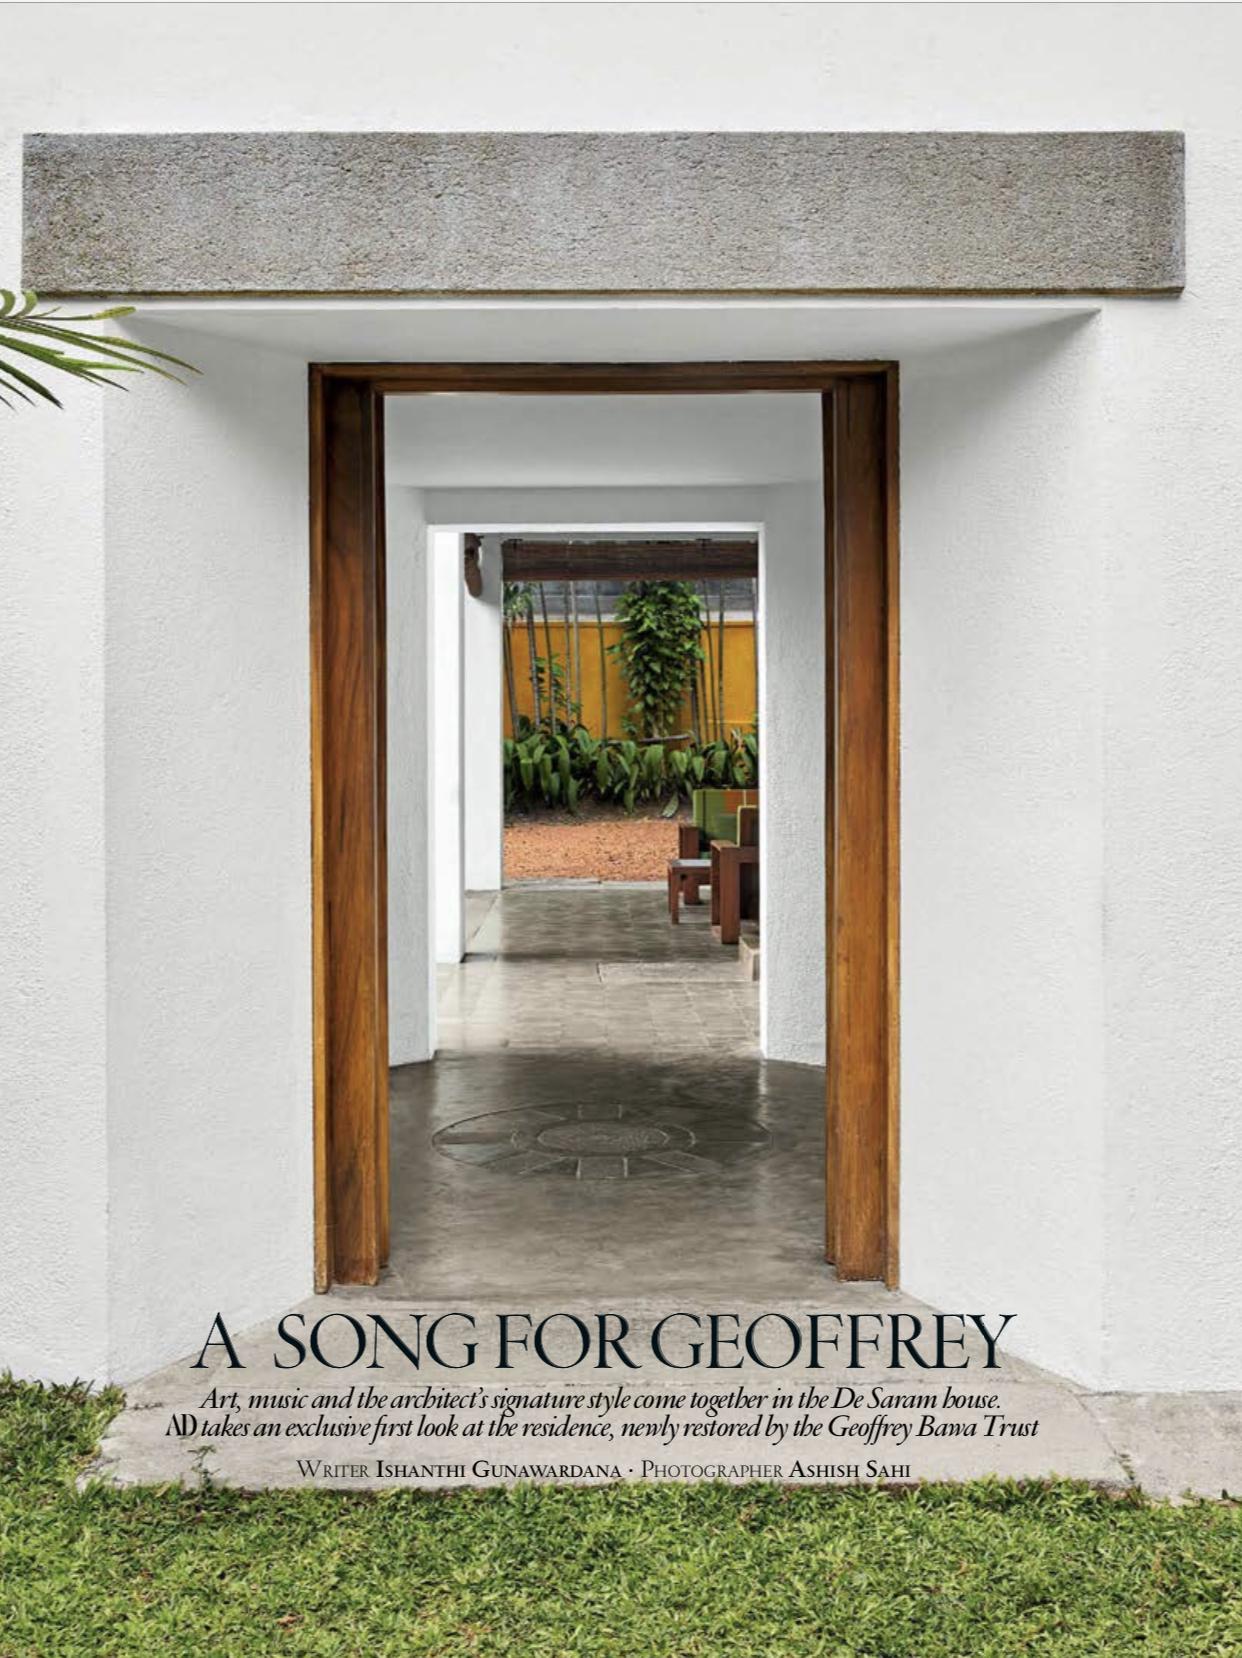 Sri Lankan Architecture - De Saram house - Geoffrey Bawa